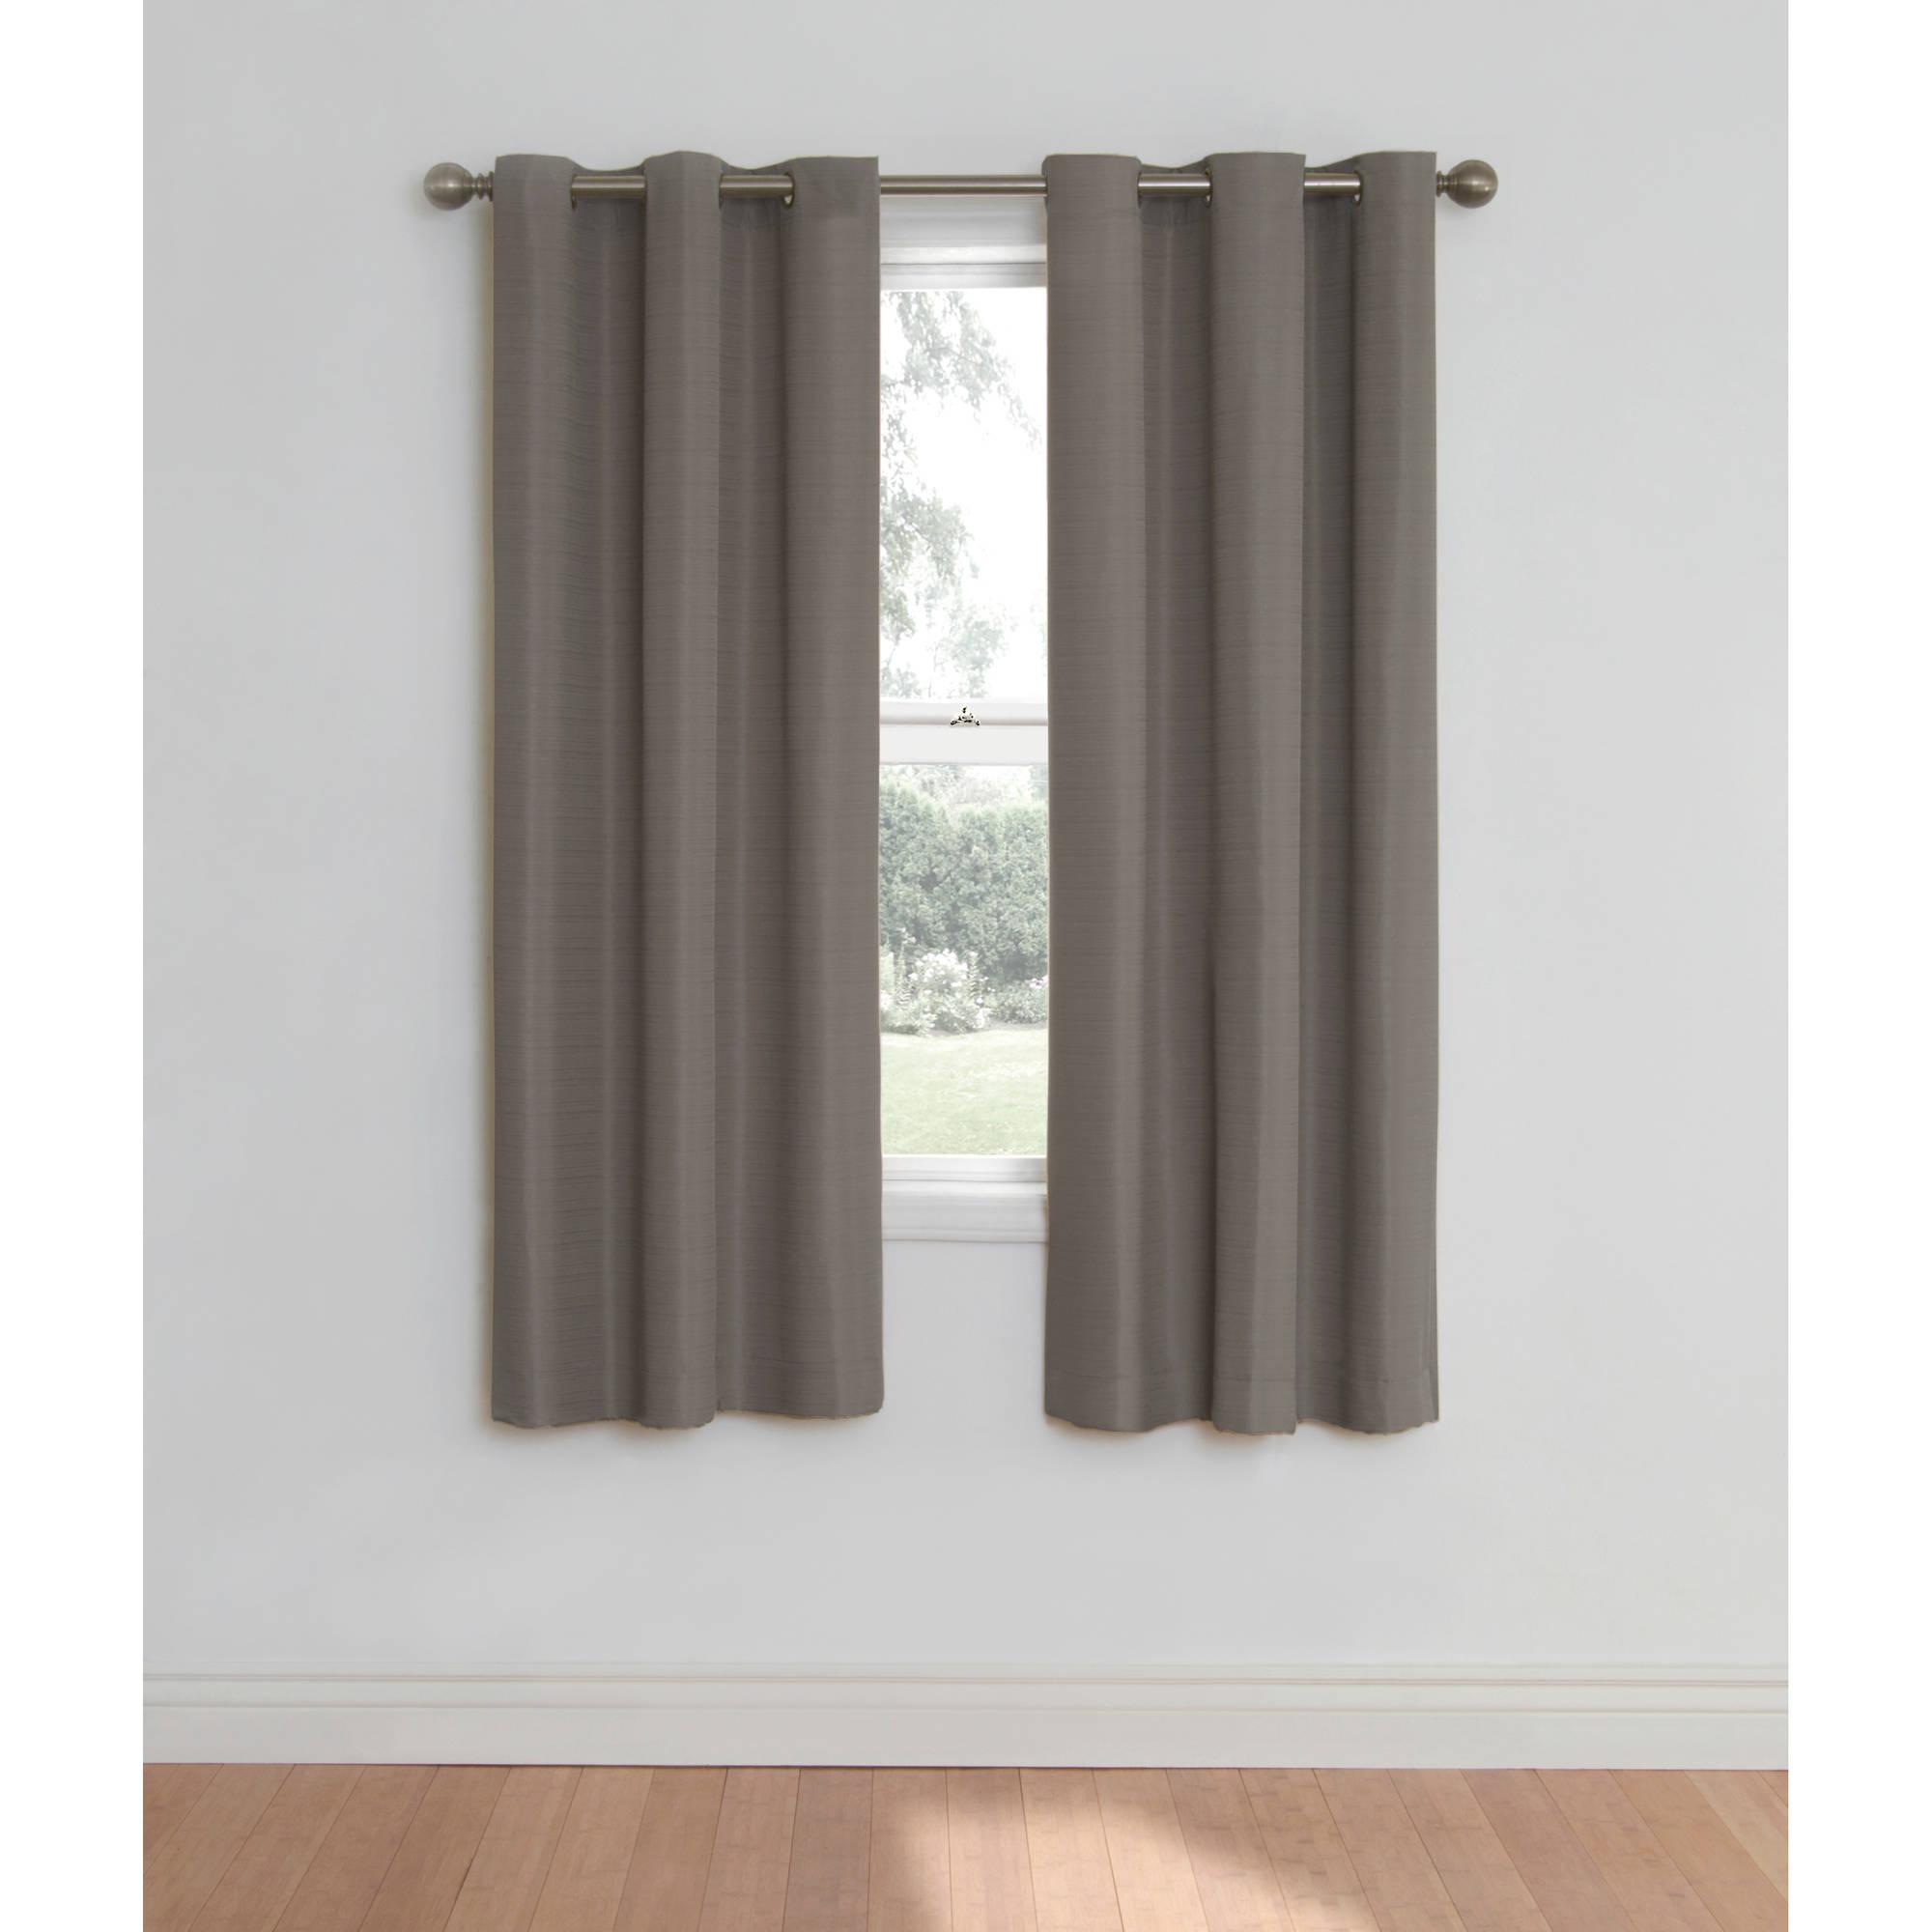 Ideas: Sensational Grommet Curtain Panels With Inspiring within Ultimate Blackout Short Length Grommet Panels (Image 14 of 30)